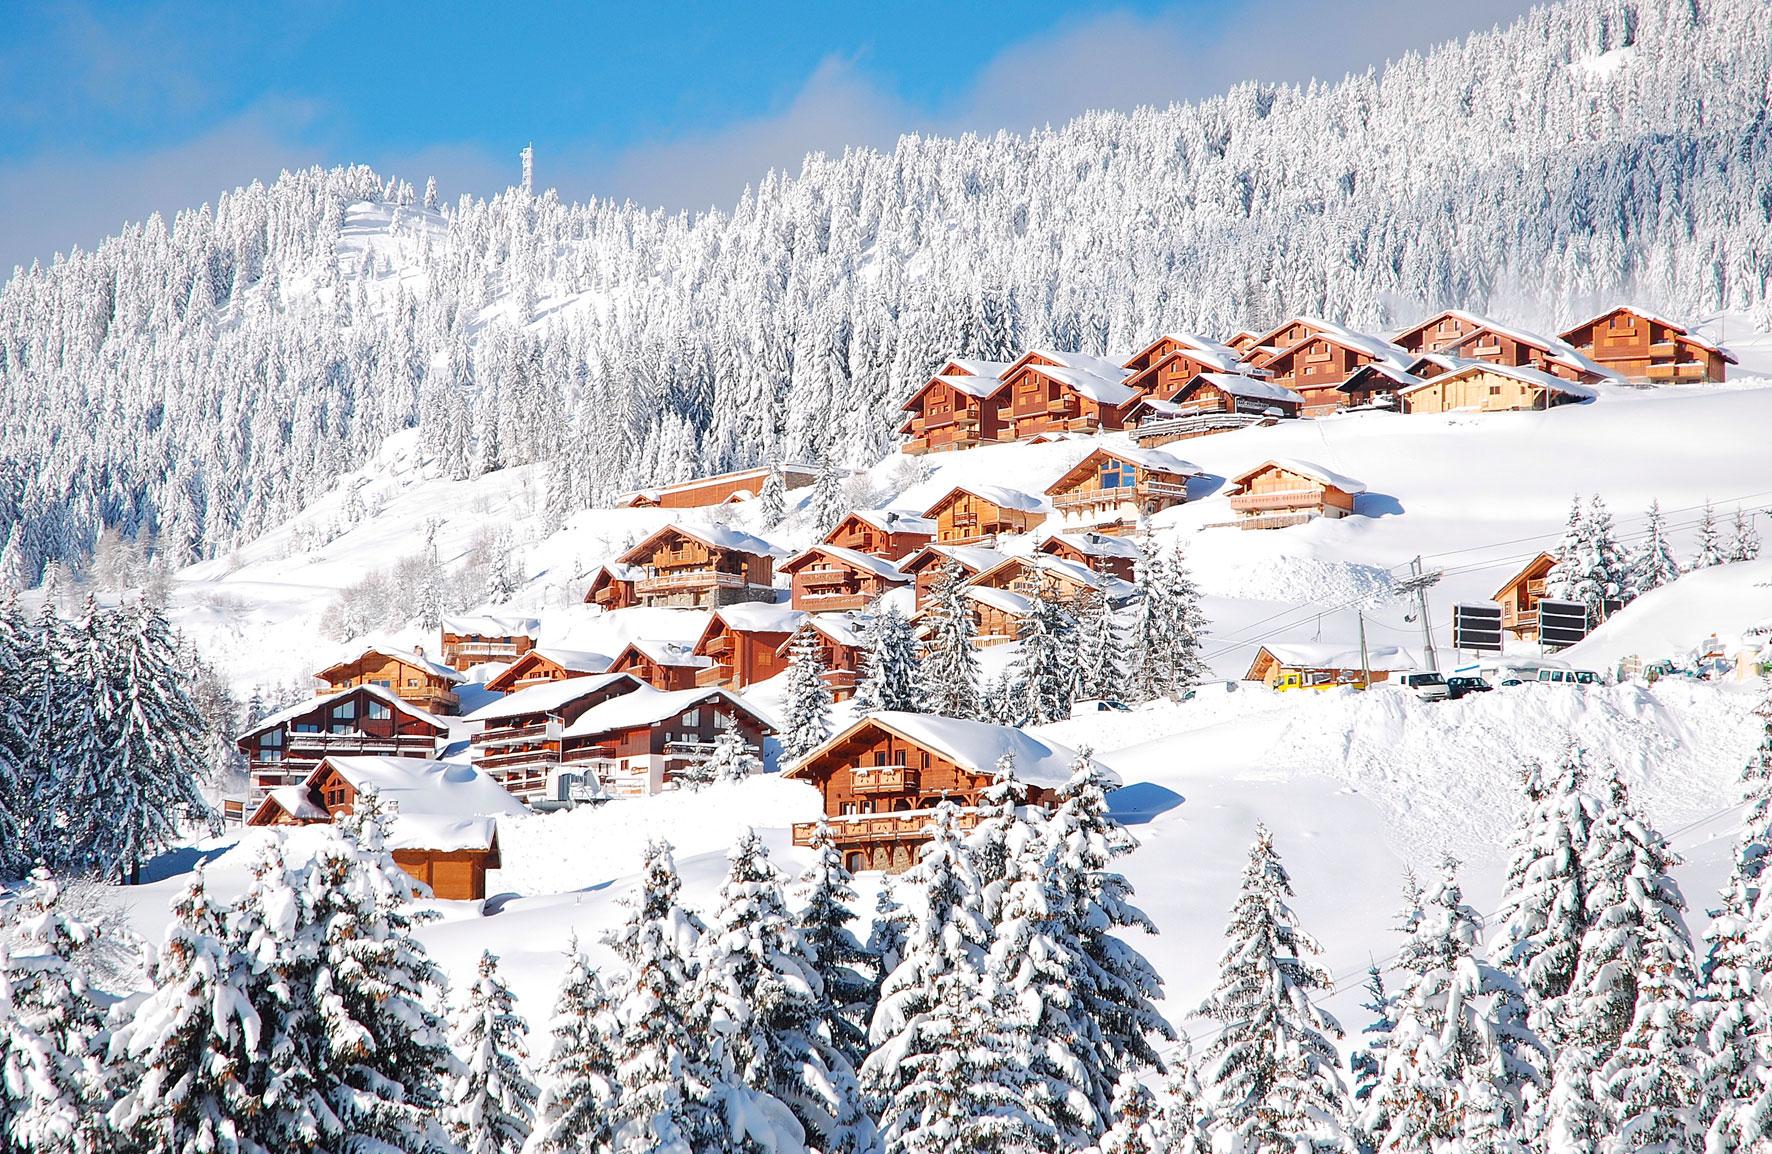 Bisanne 1500 - Vue d'ensemble - Crédits photos http://www.bisanne1500.fr/Appartement en Location à Bisanne 1500 - Villard sur Doron - Savoie - Alpes